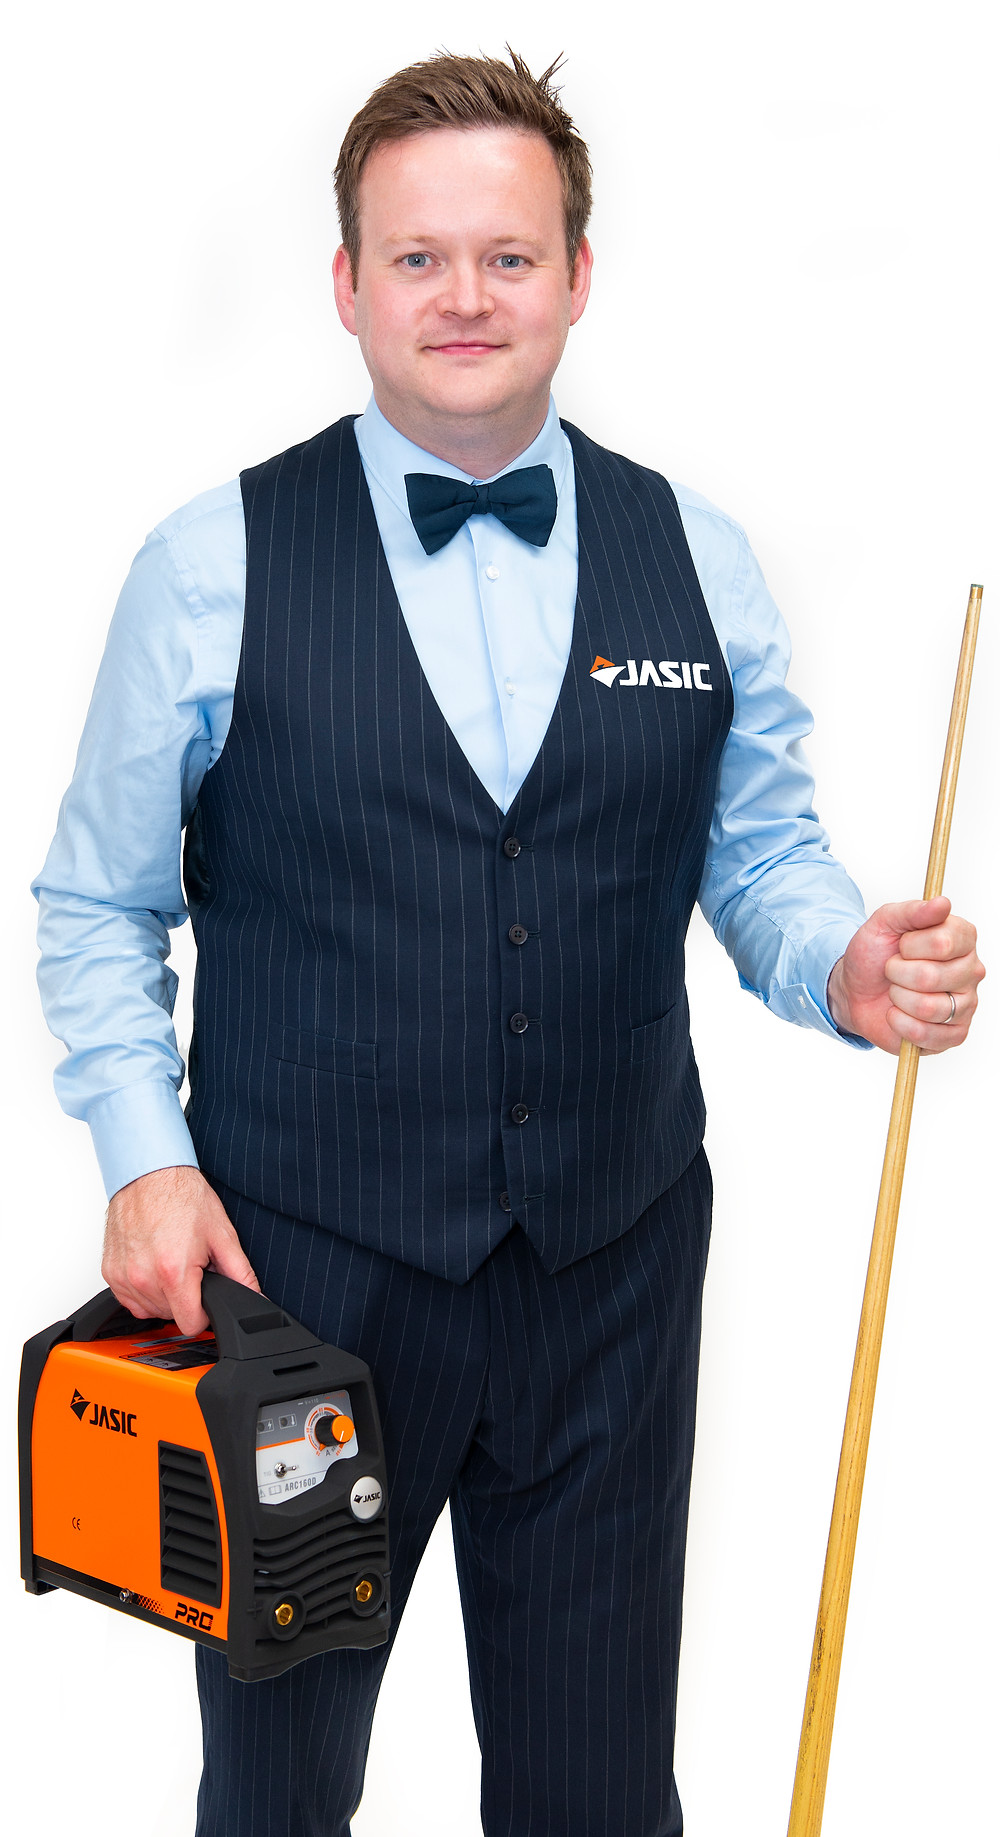 Jasic Sponsored Snooker Star Shaun Murphy